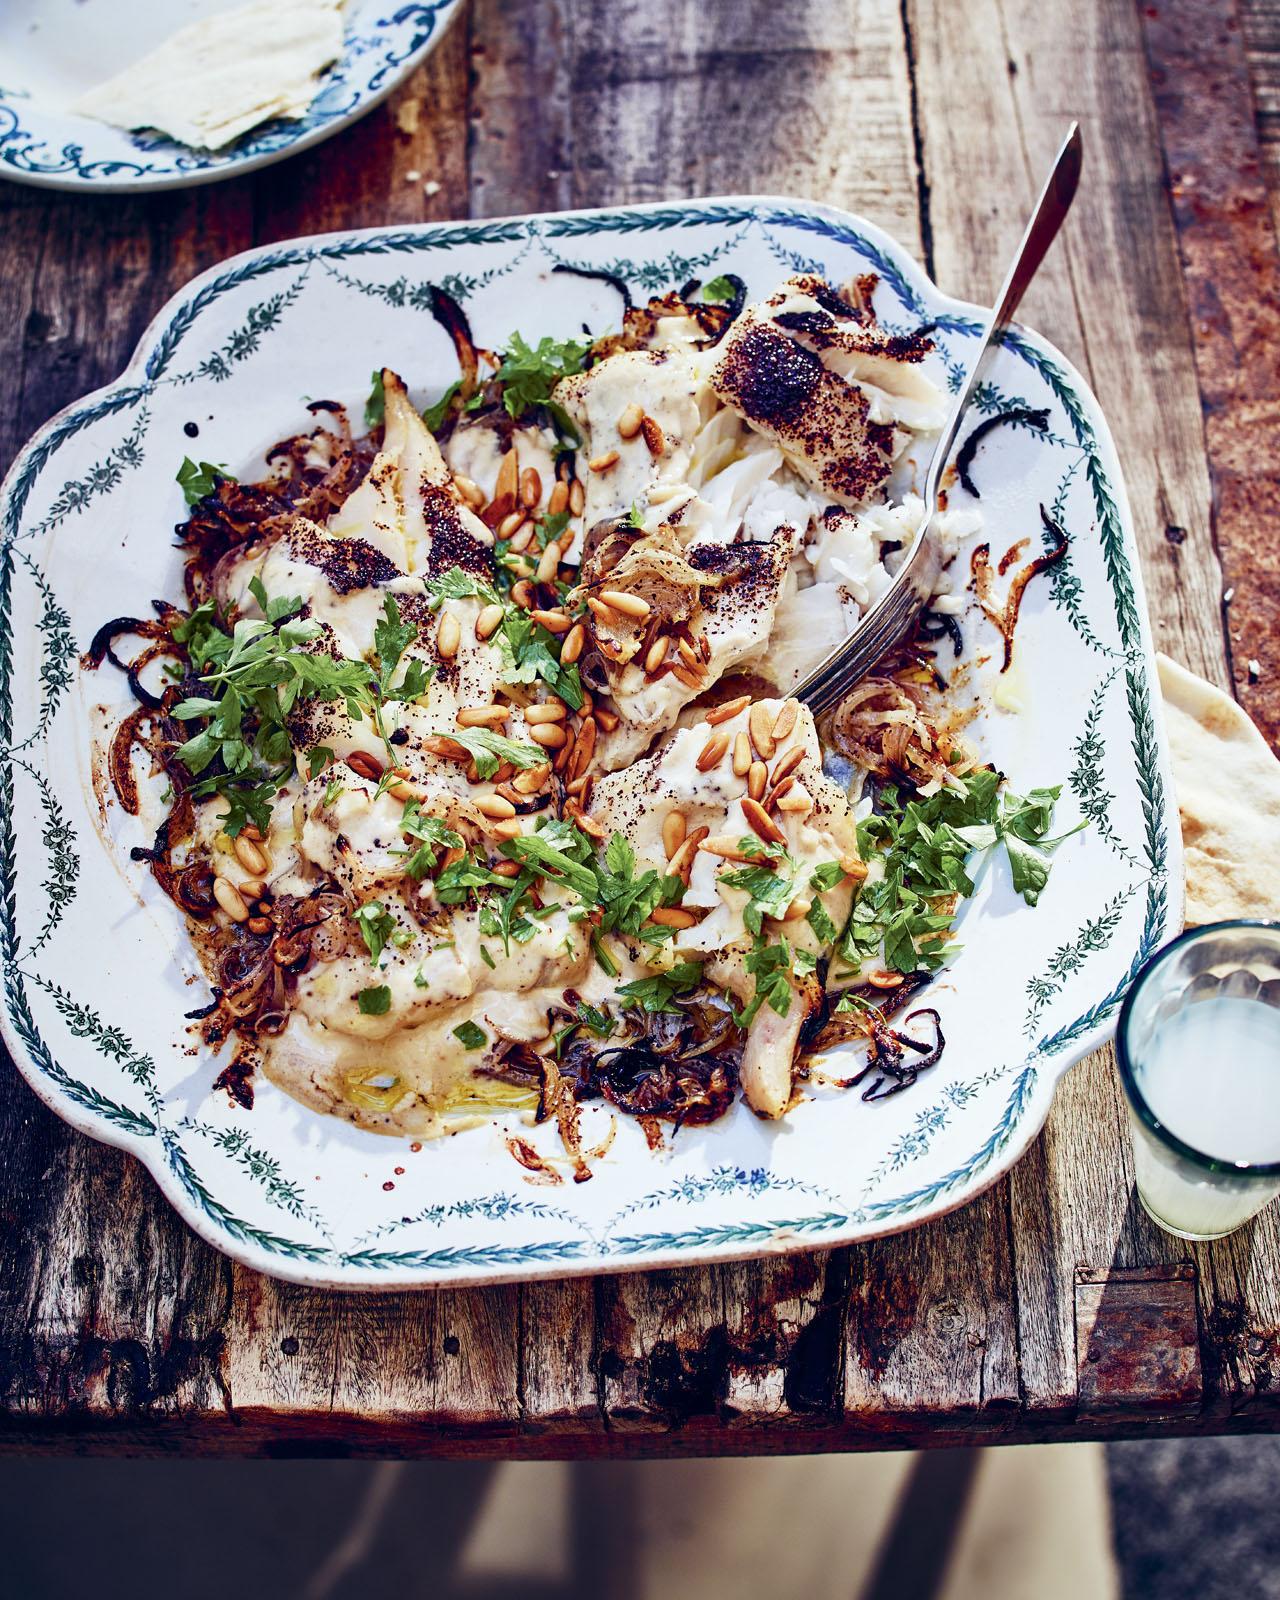 Syrian Fish with Sumac Tahini sauce